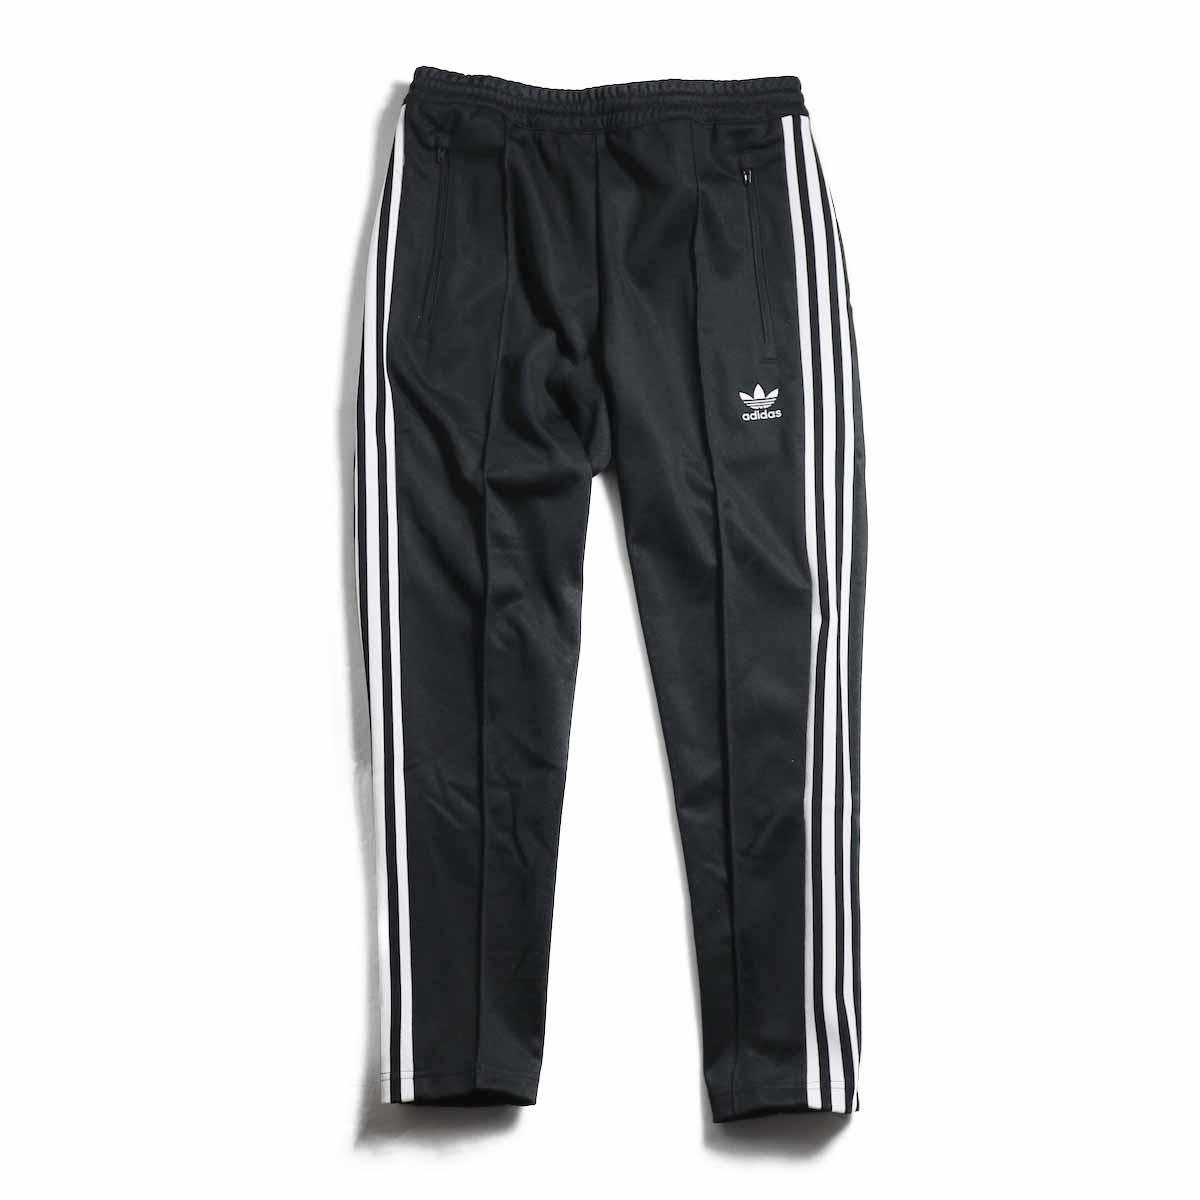 adidas originals / Beckenbauer Track Pants -Black 正面